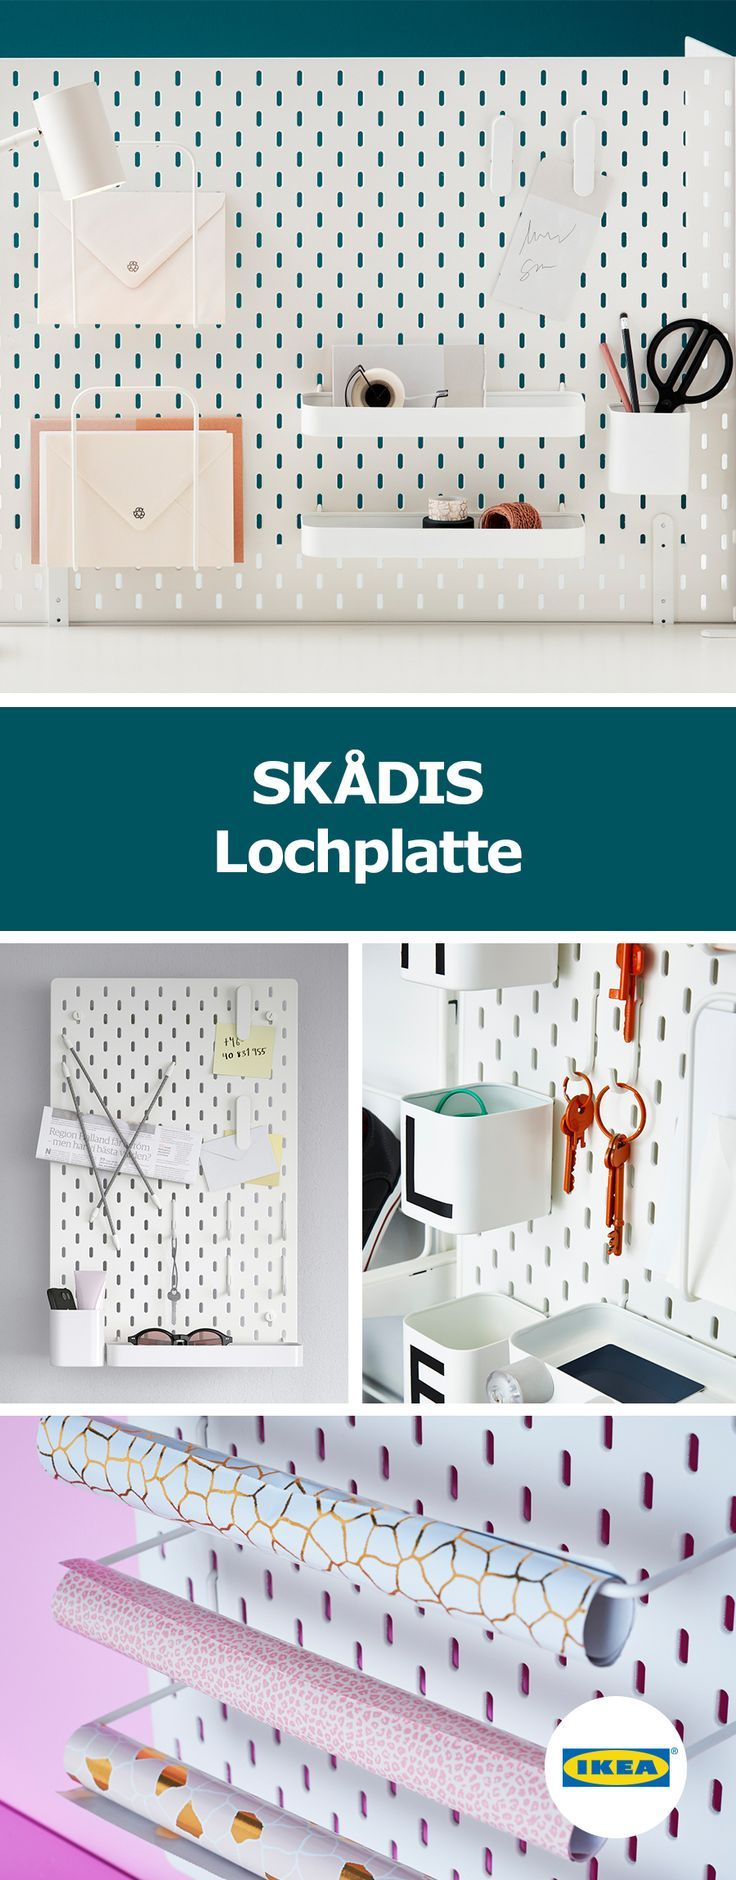 14470 best Interior Design images on Pinterest   Home ideas, Sweet ...